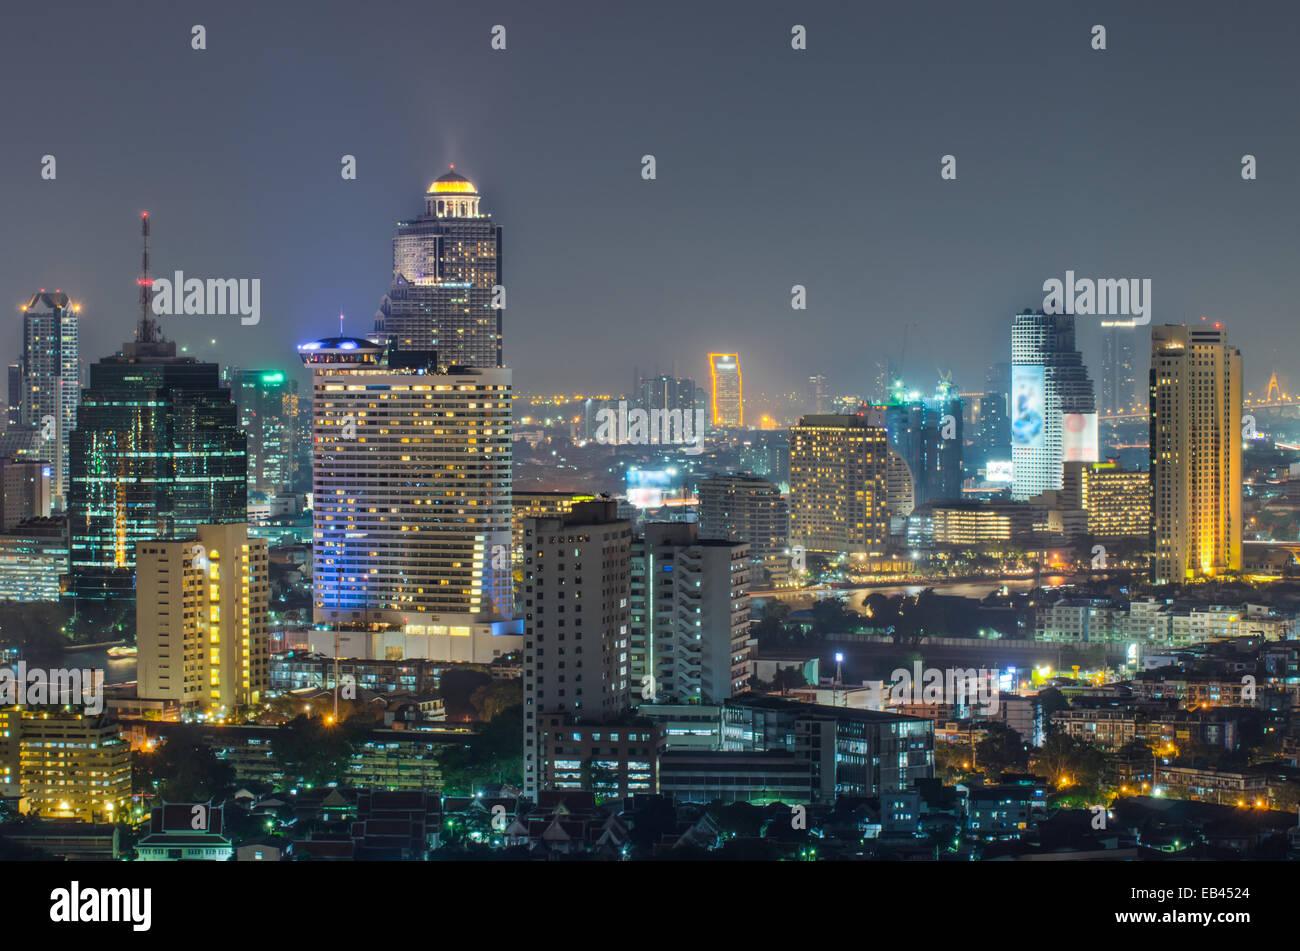 Bangkok city night view, Thailand - Stock Image